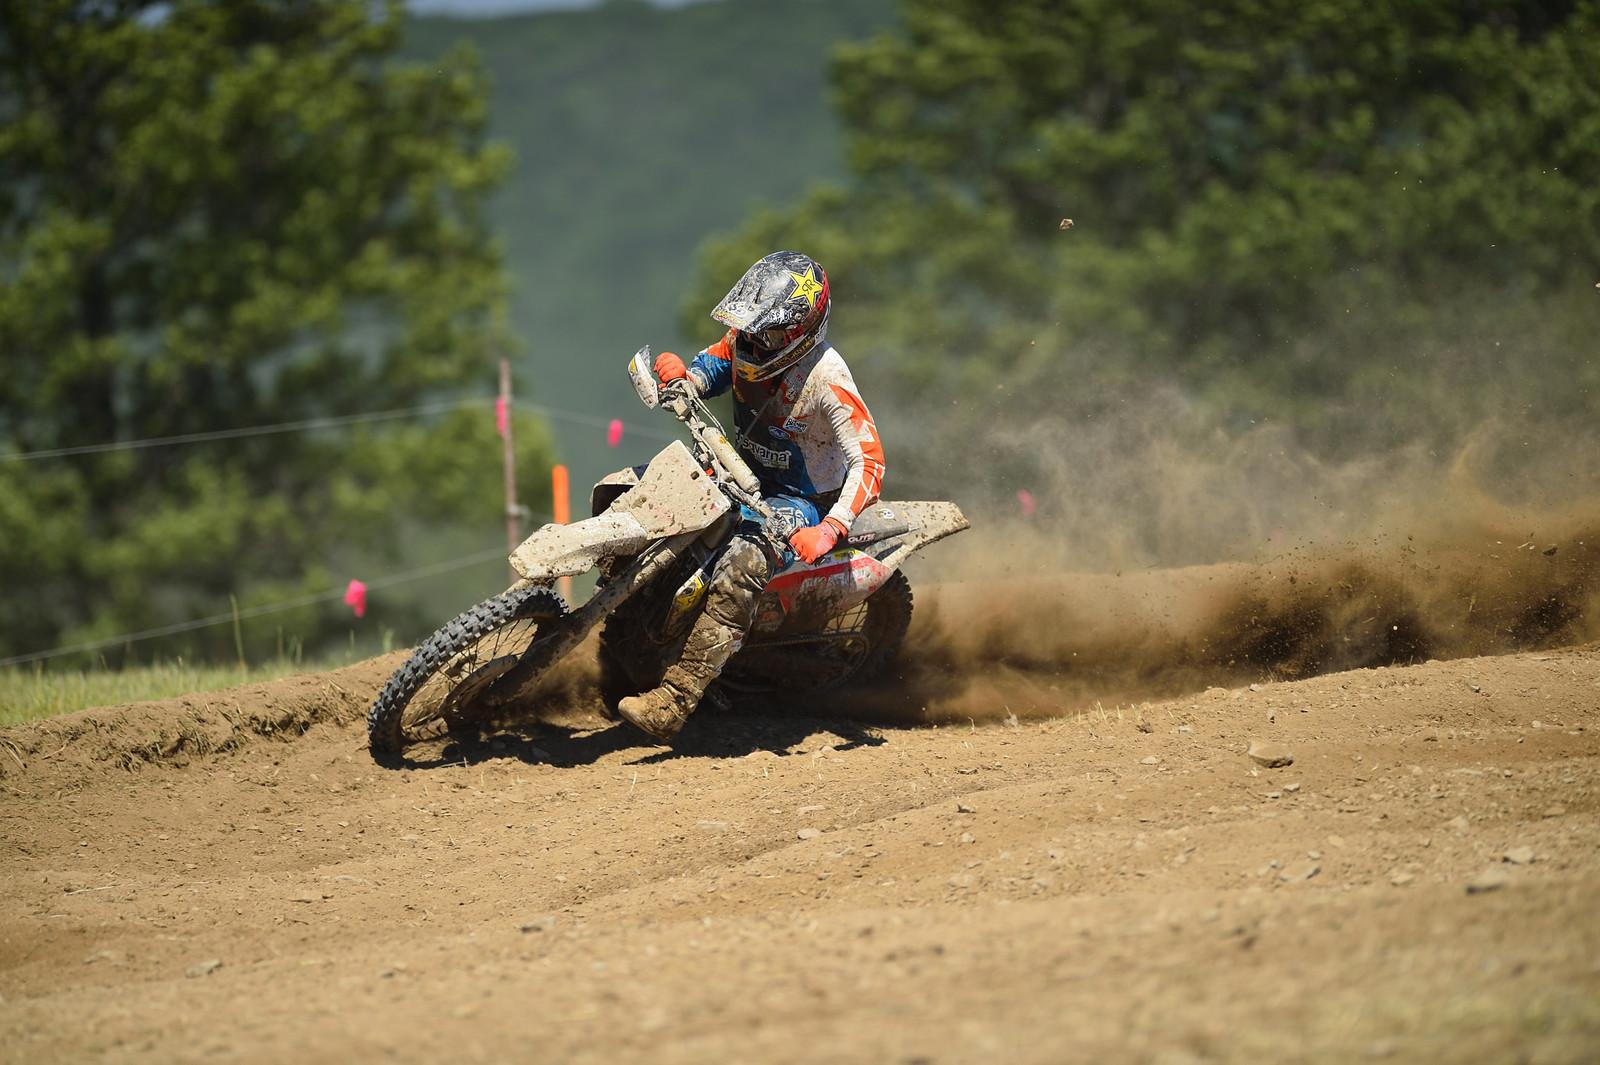 Thad Duvall - Tomahawk GNCC - Motocross Pictures - Vital MX